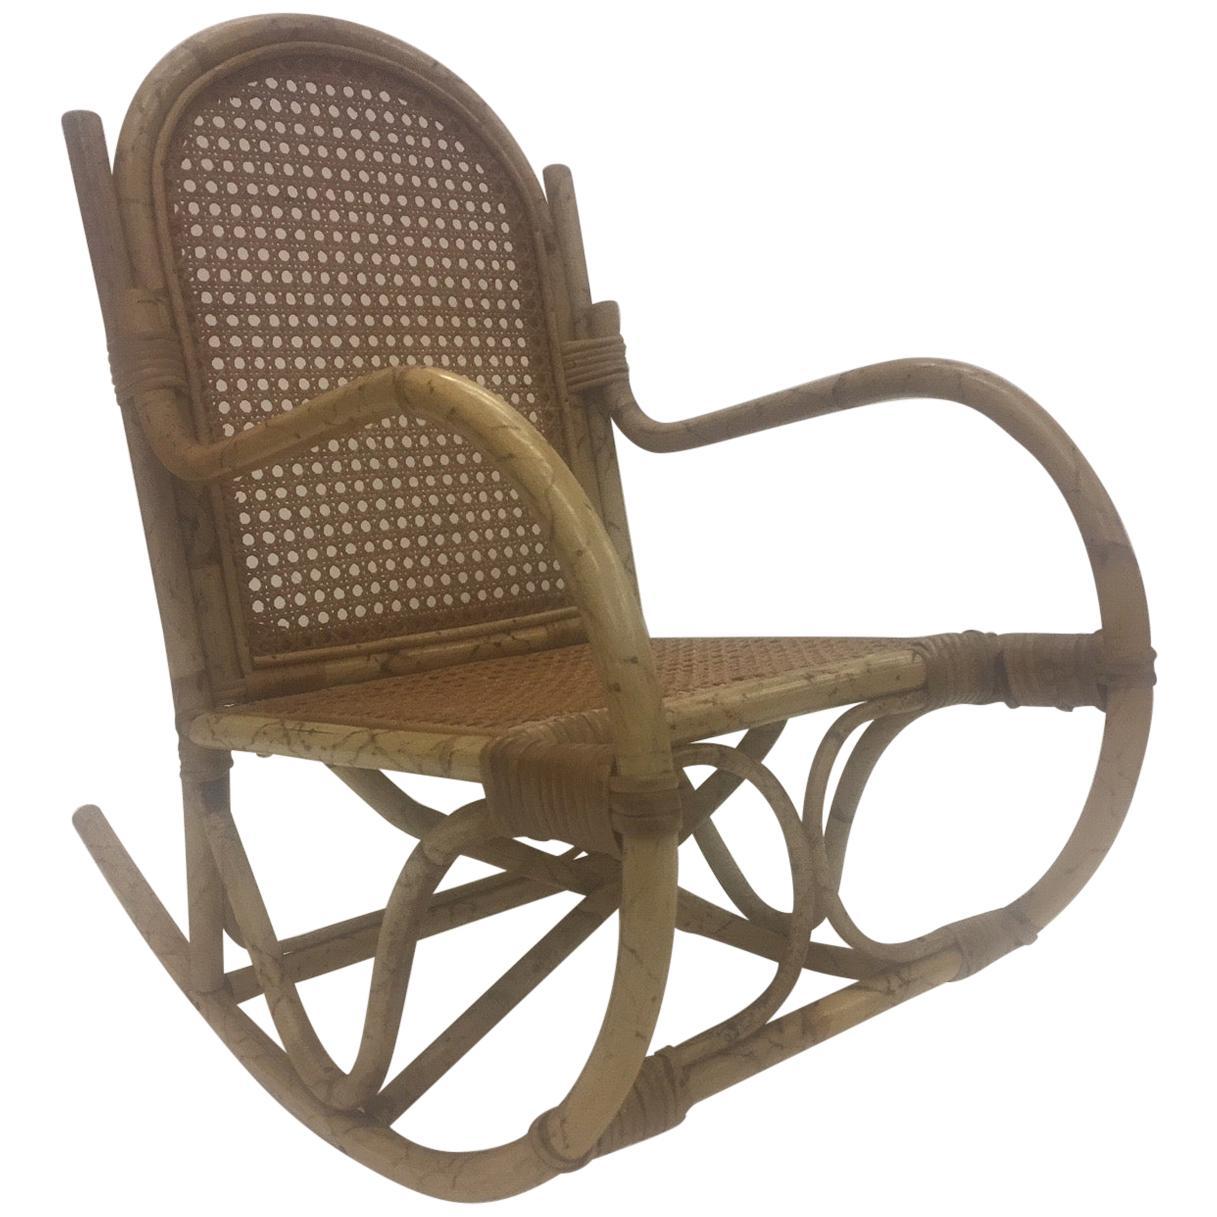 Darling Rattan Child's Rocking Chair